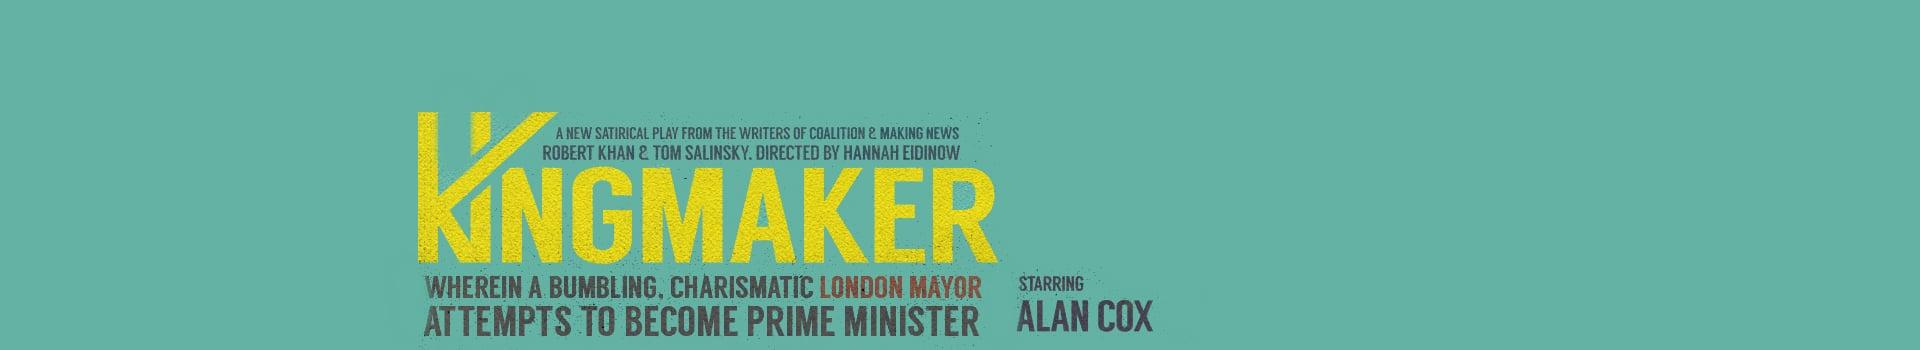 Kingmaker tickets London Arts Theatre